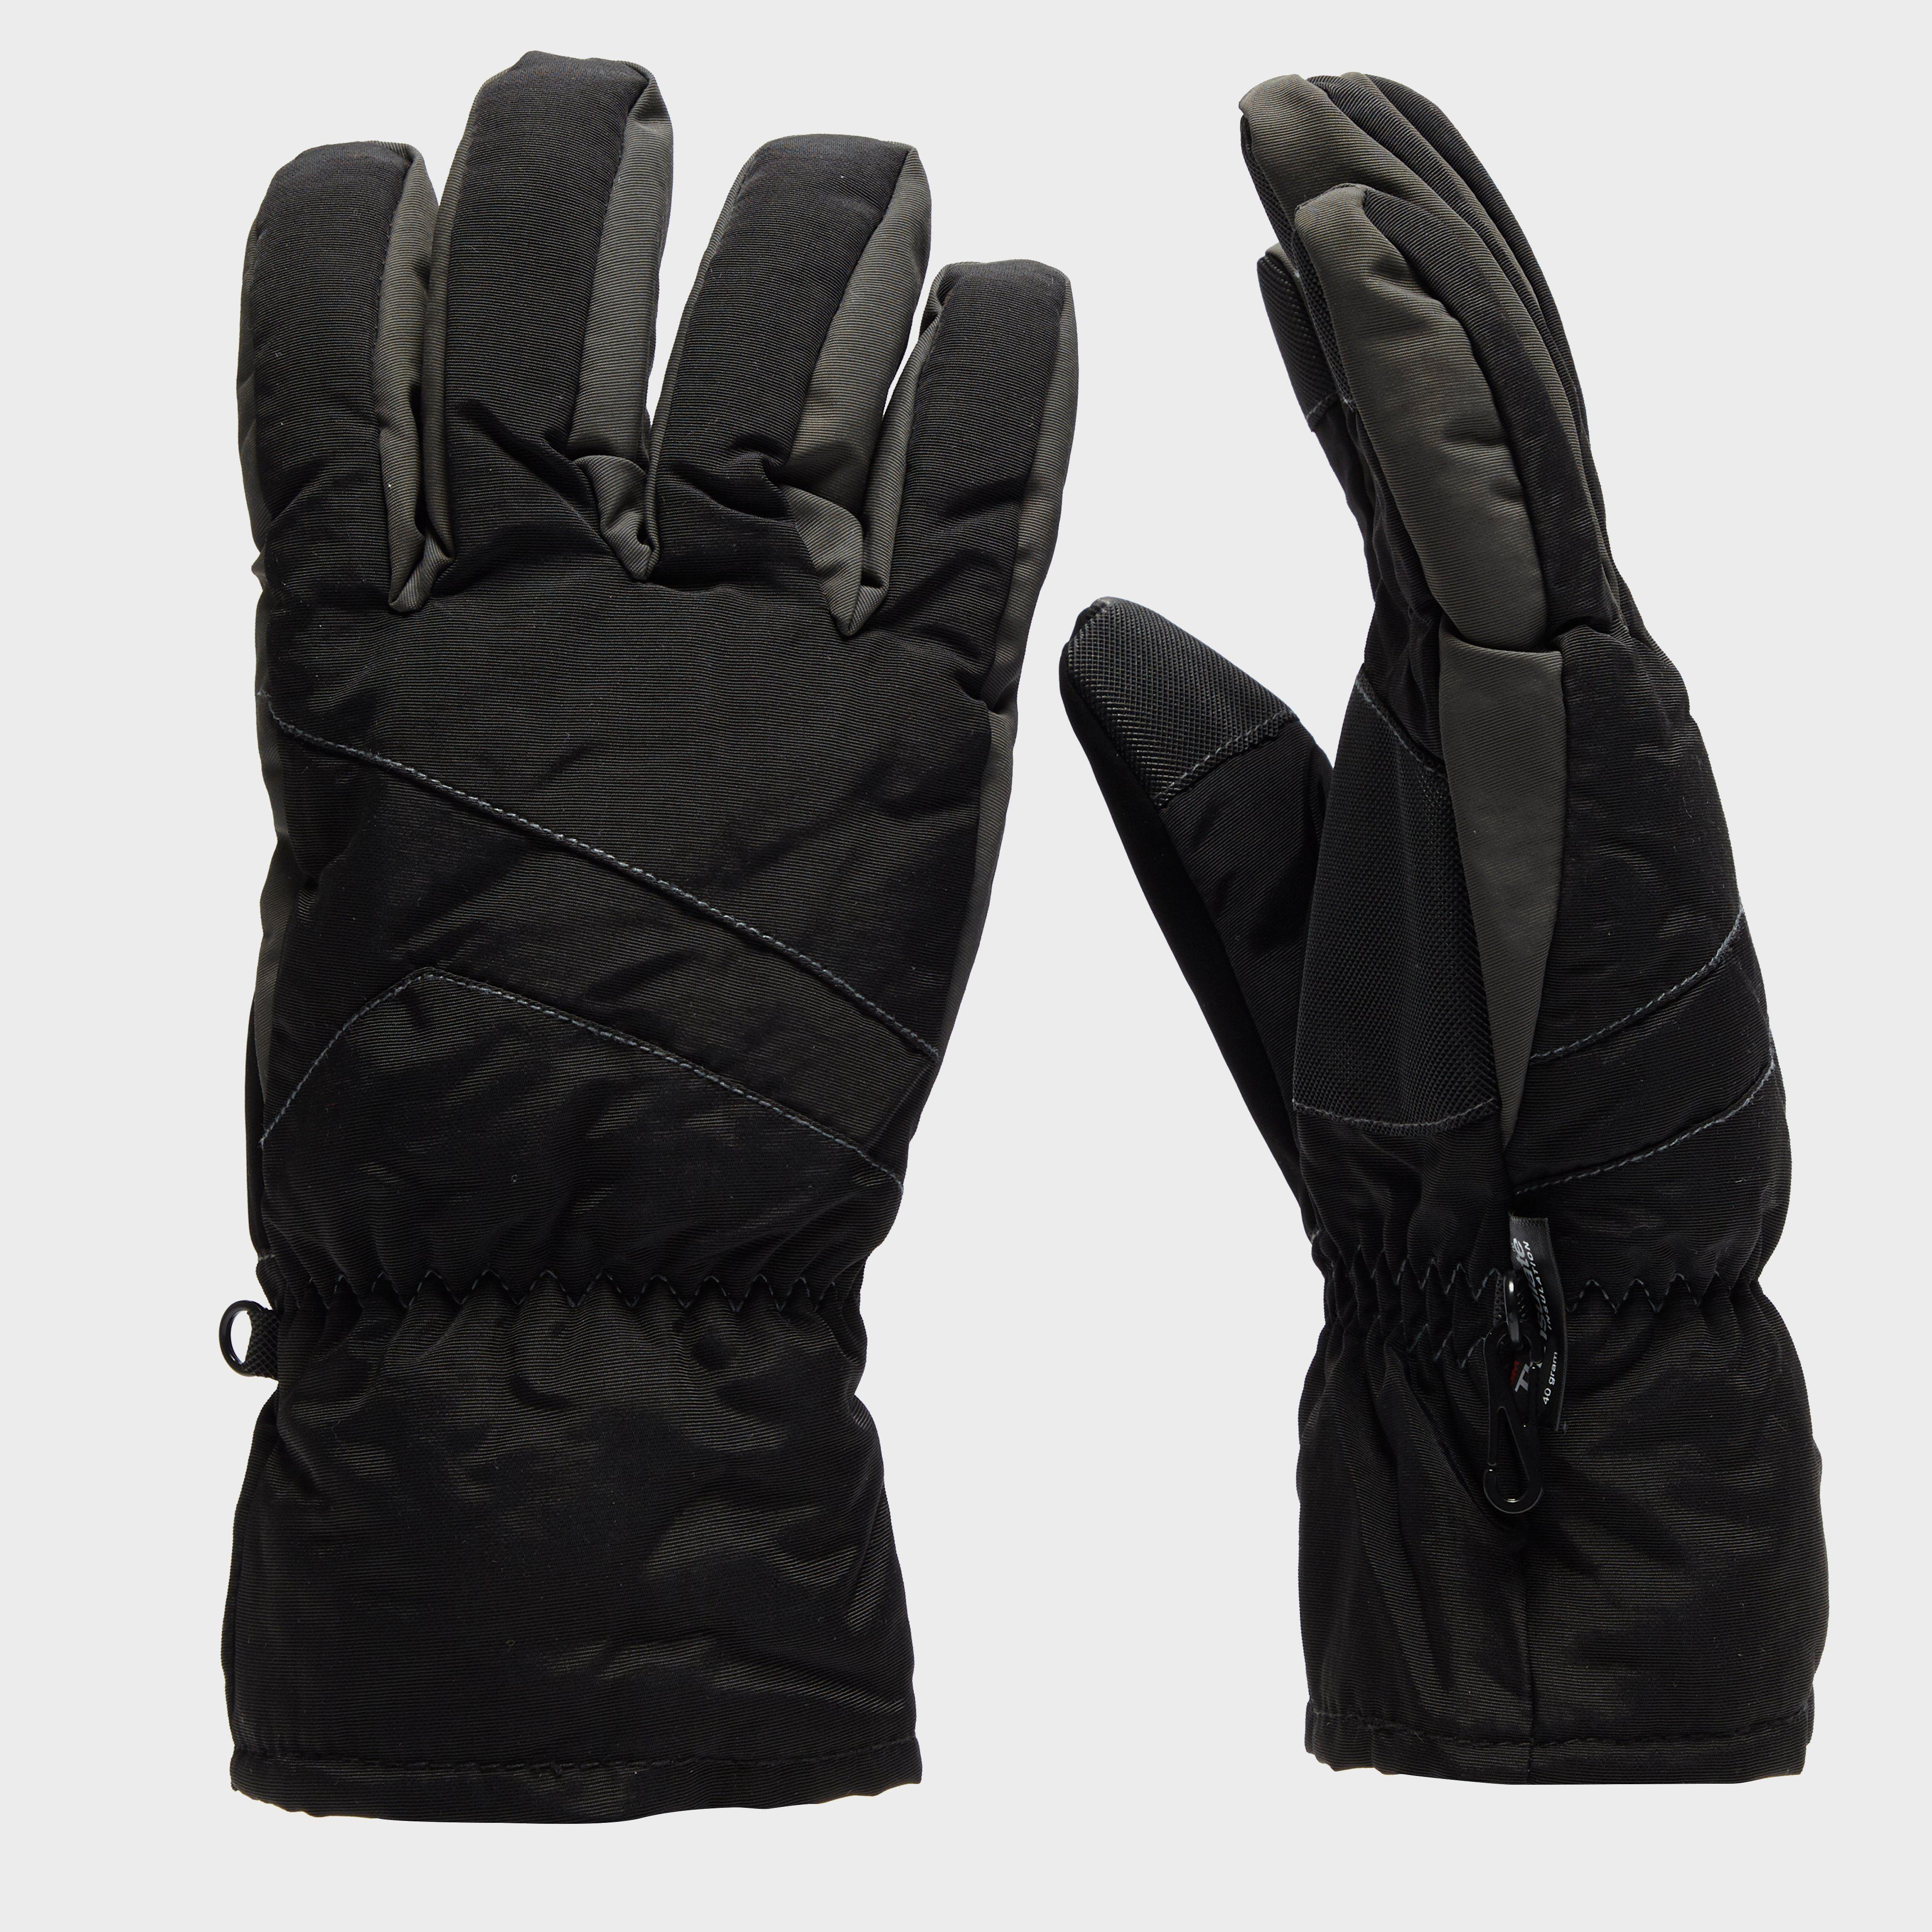 PETER STORM Men's Ski Gloves